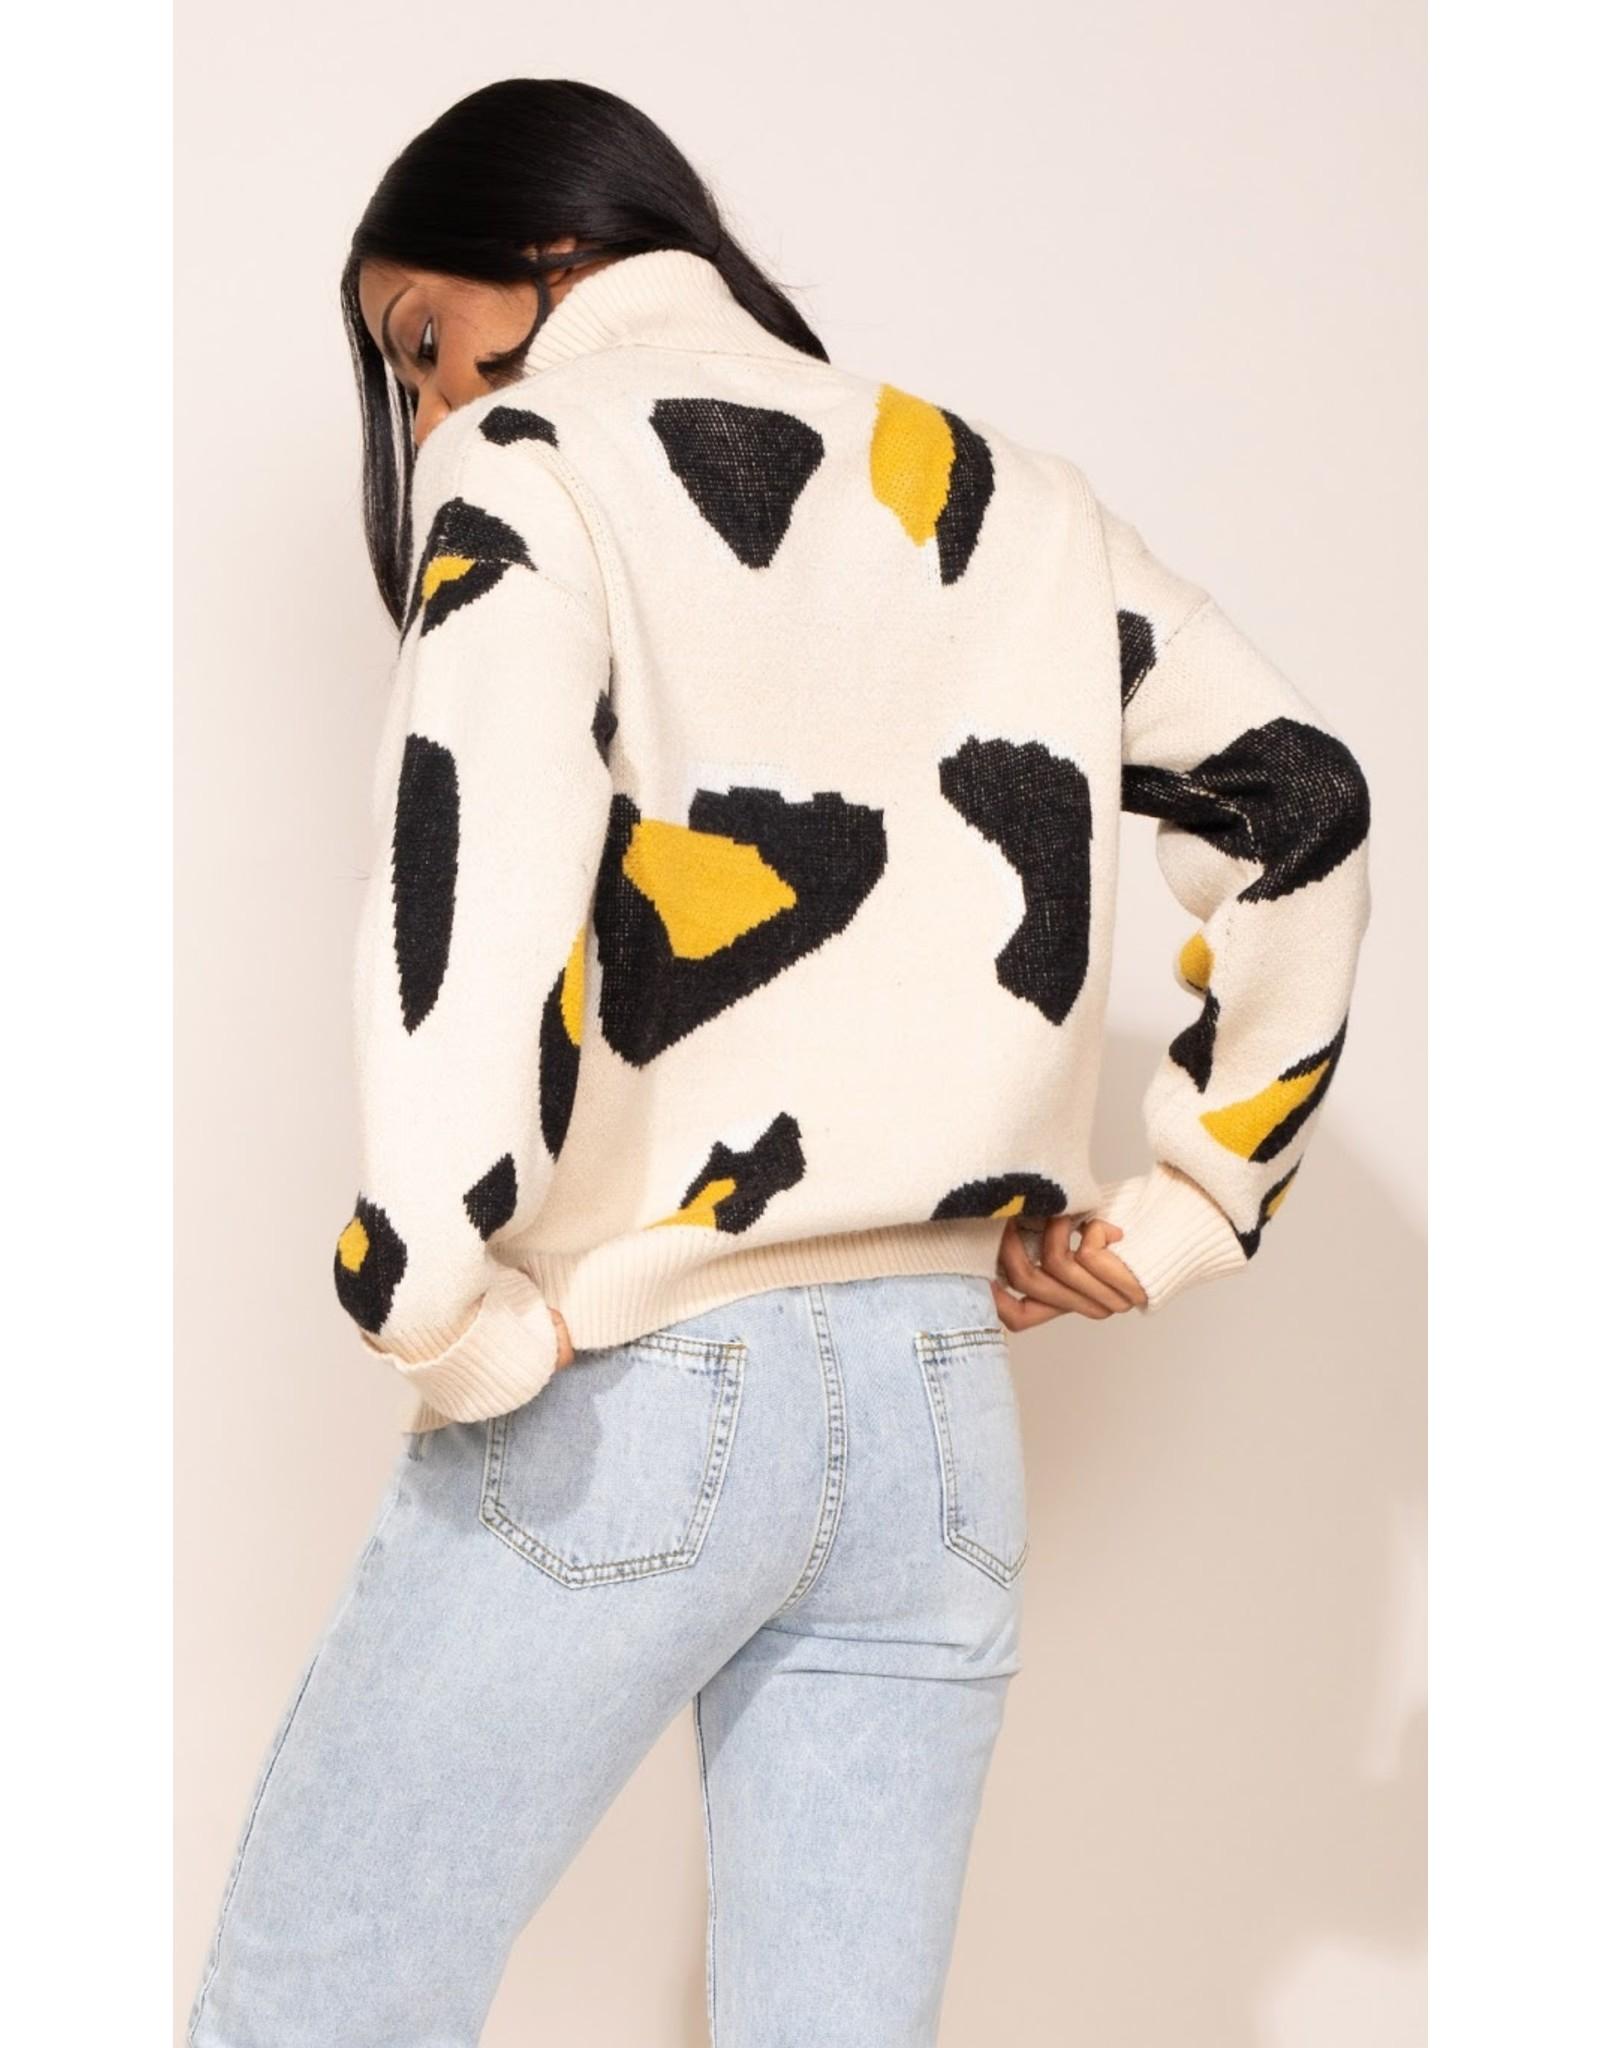 The Wild Sweater